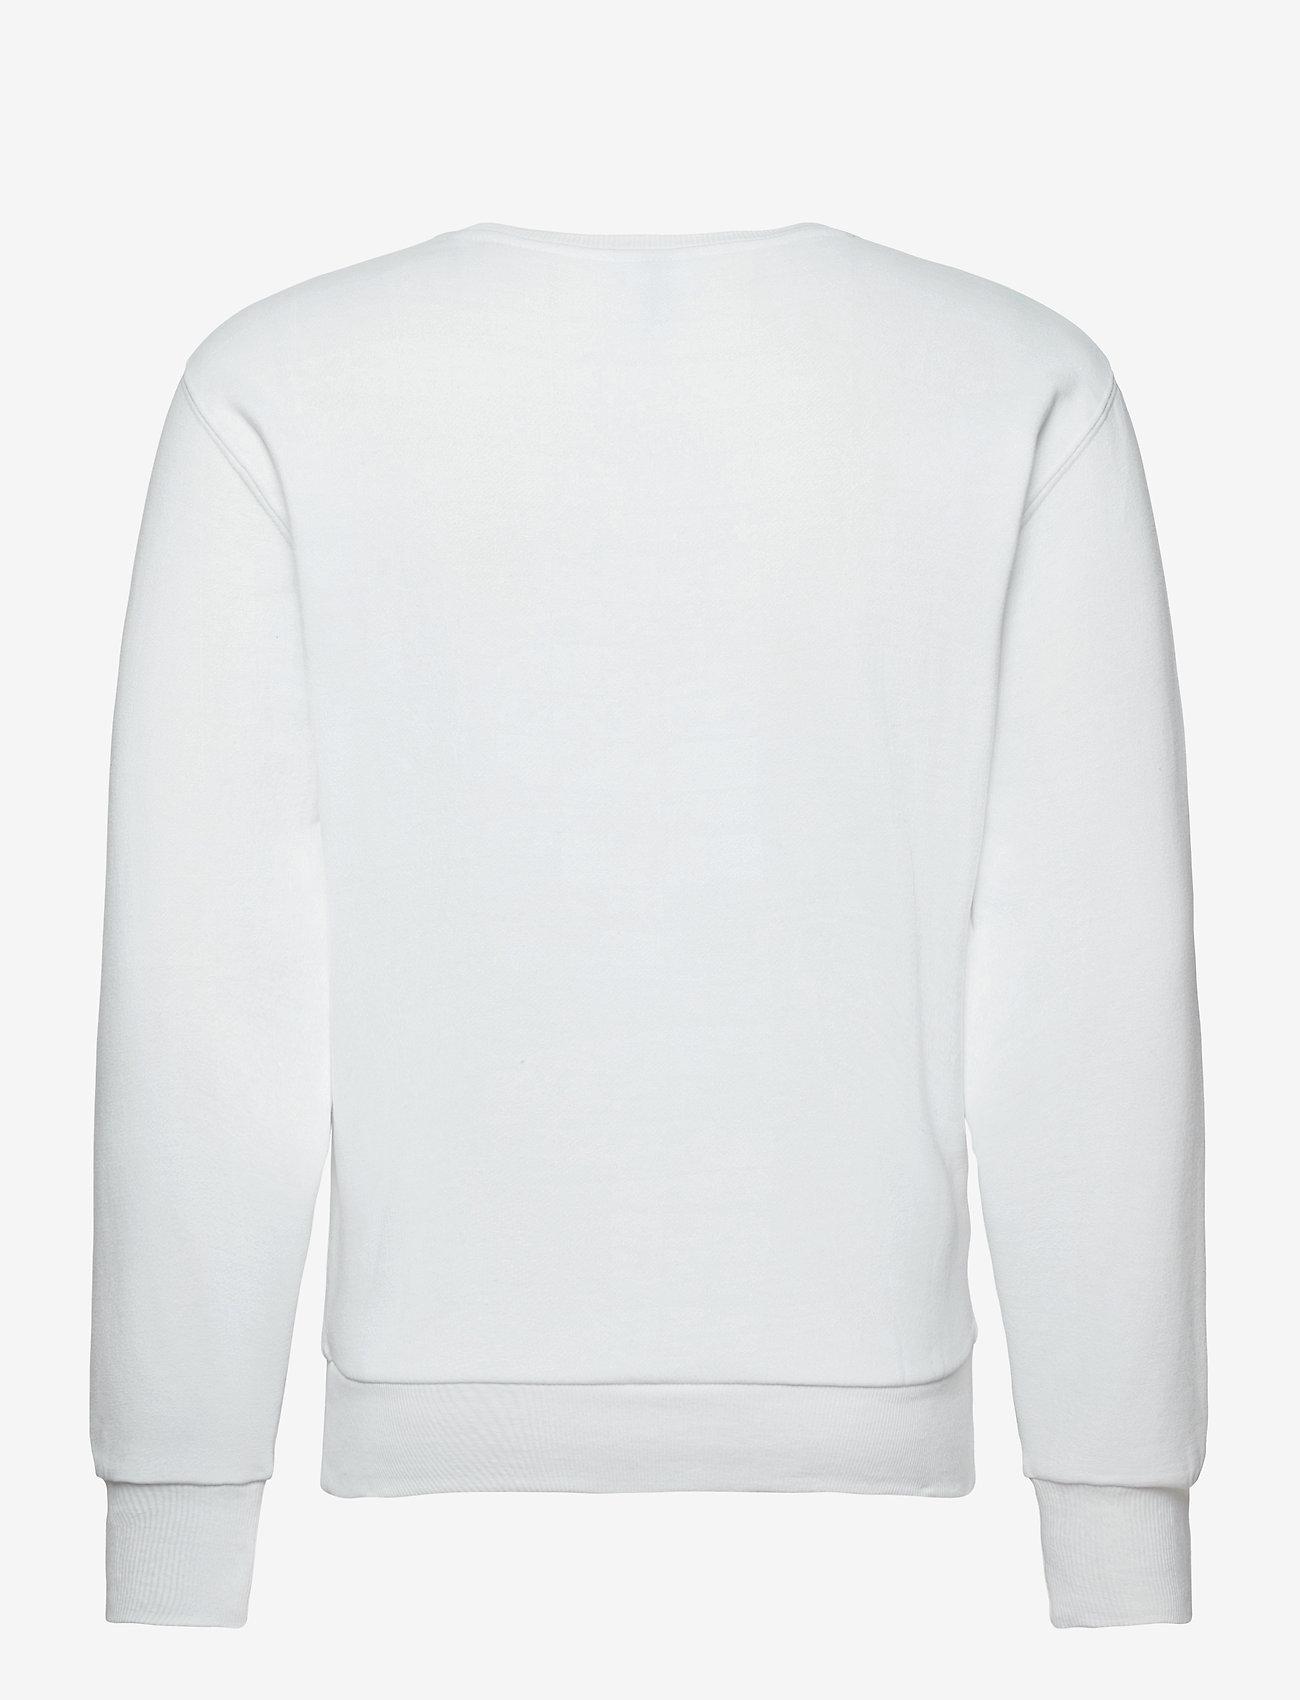 Ellesse EL SUCCISO (NEW LOGO) - Sweatshirts WHITE - Menn Klær